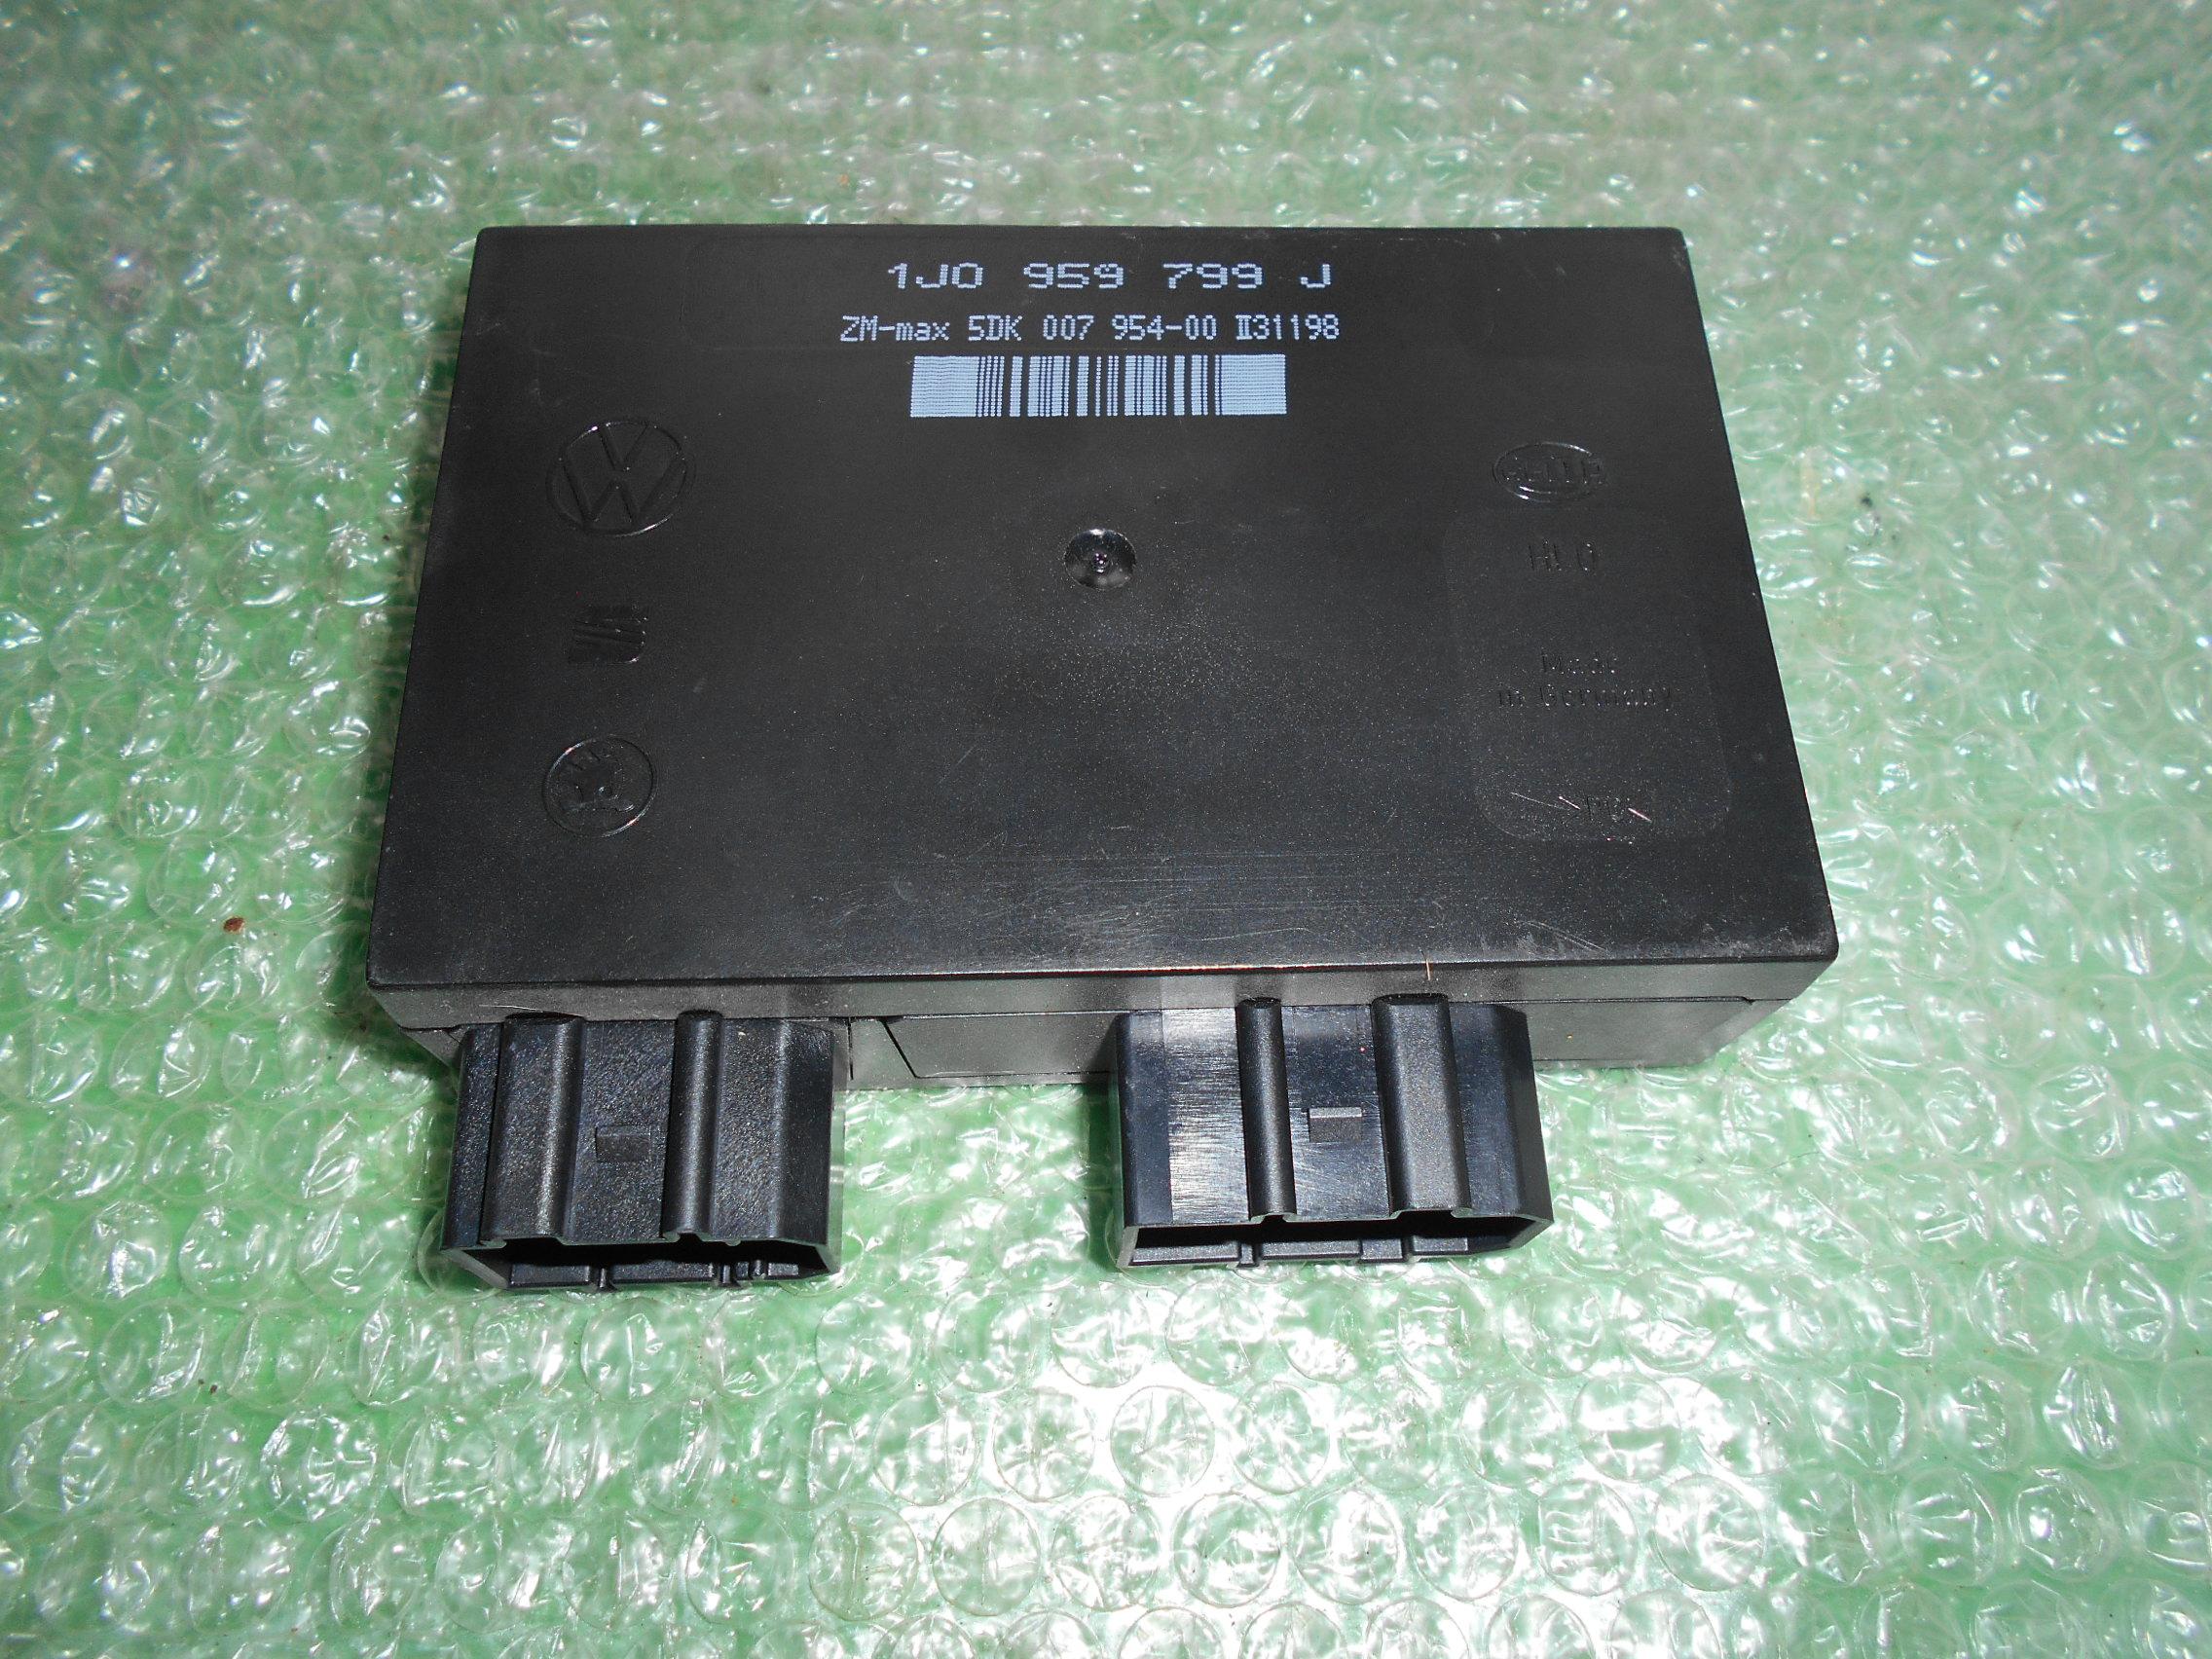 MODULO DE APOYO DE CONFORT 1J0959799J – HELLA 5DK007954-00 SEAT LEON I – SEAT TOLEDO II – VOLKSWAGEN GOLF IV – VW PASSAT (B5)(1999-2004)